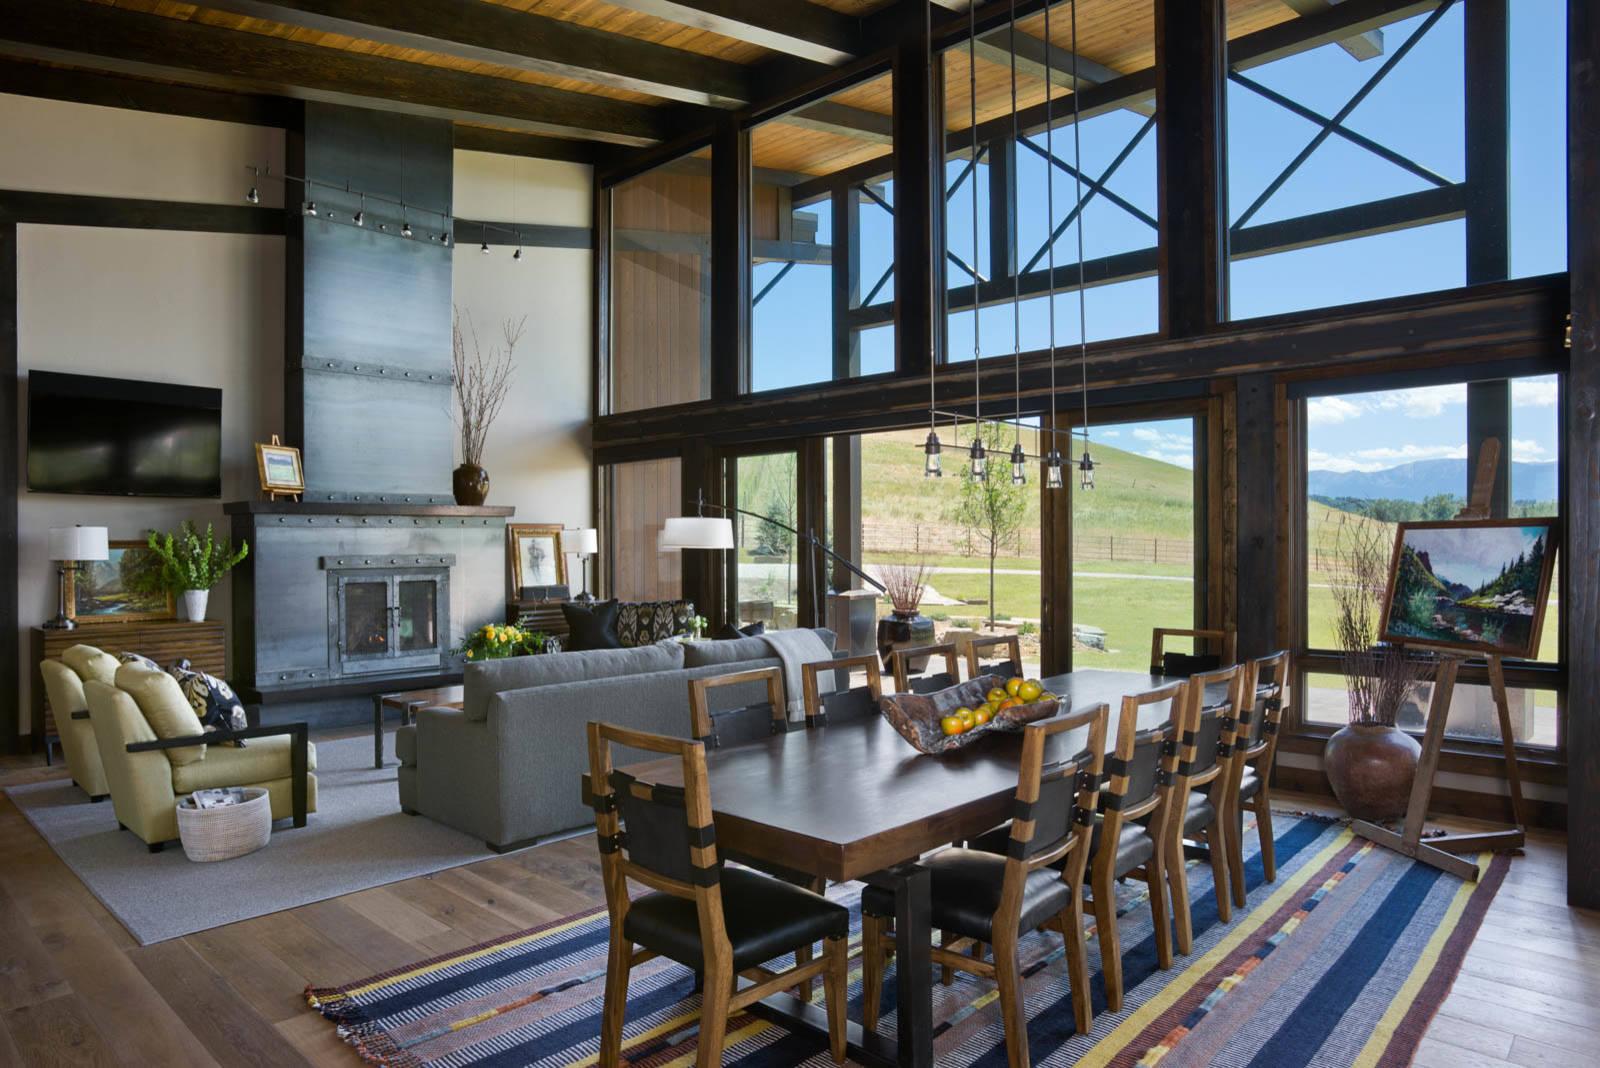 Modern Rustic Cabin Rustic Living Room Ideas For Small Spaces Novocom Top